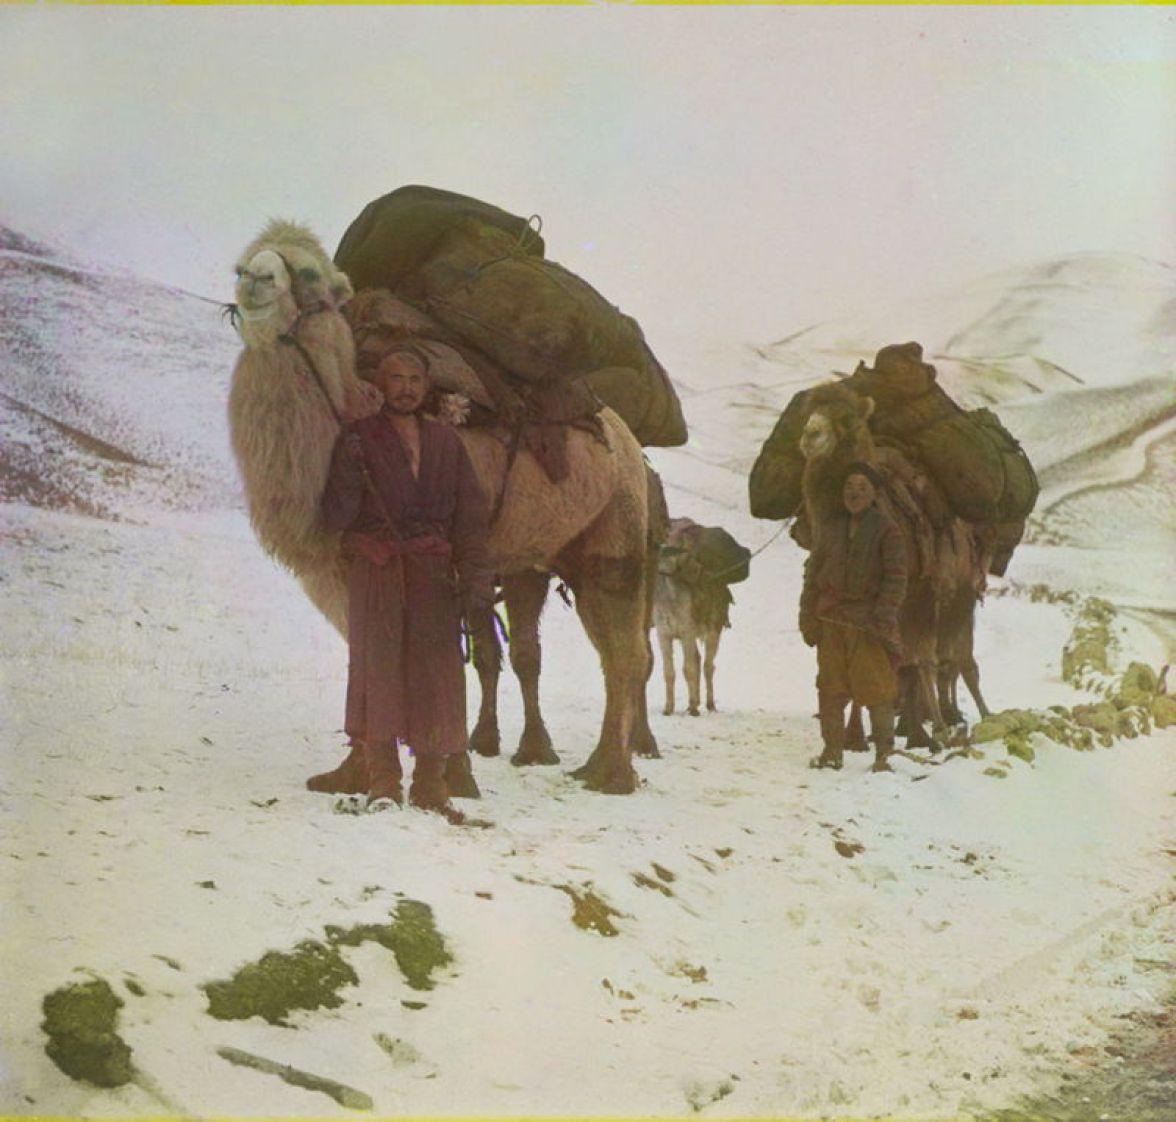 Prokudin-Gorskii, Sergei Mikhailovich. At the Sulyukta Mines, 1906-1907. 1 negative (3 frames) : glass, b&w, three-color separation. Library of Congress, Prokudin-Gorskii Collection.